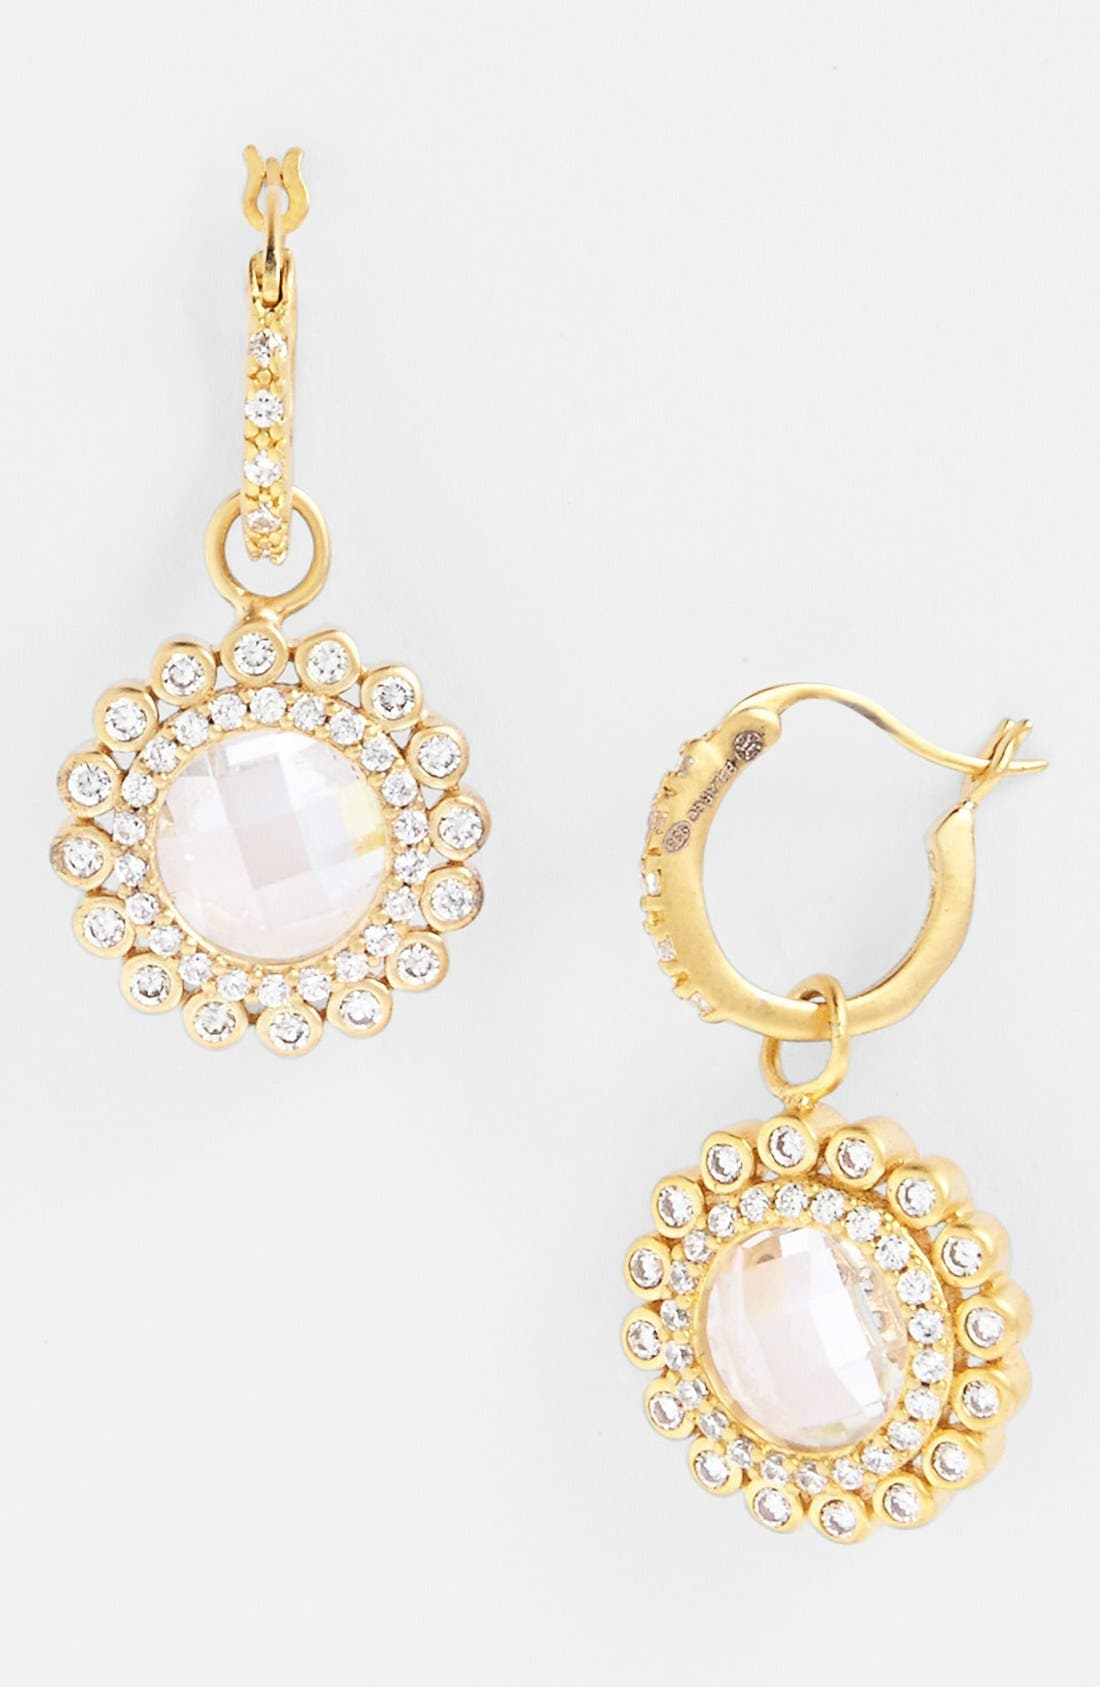 Main Image - FREIDA ROTHMAN 'Hamptons' Sunflower Drop Earrings